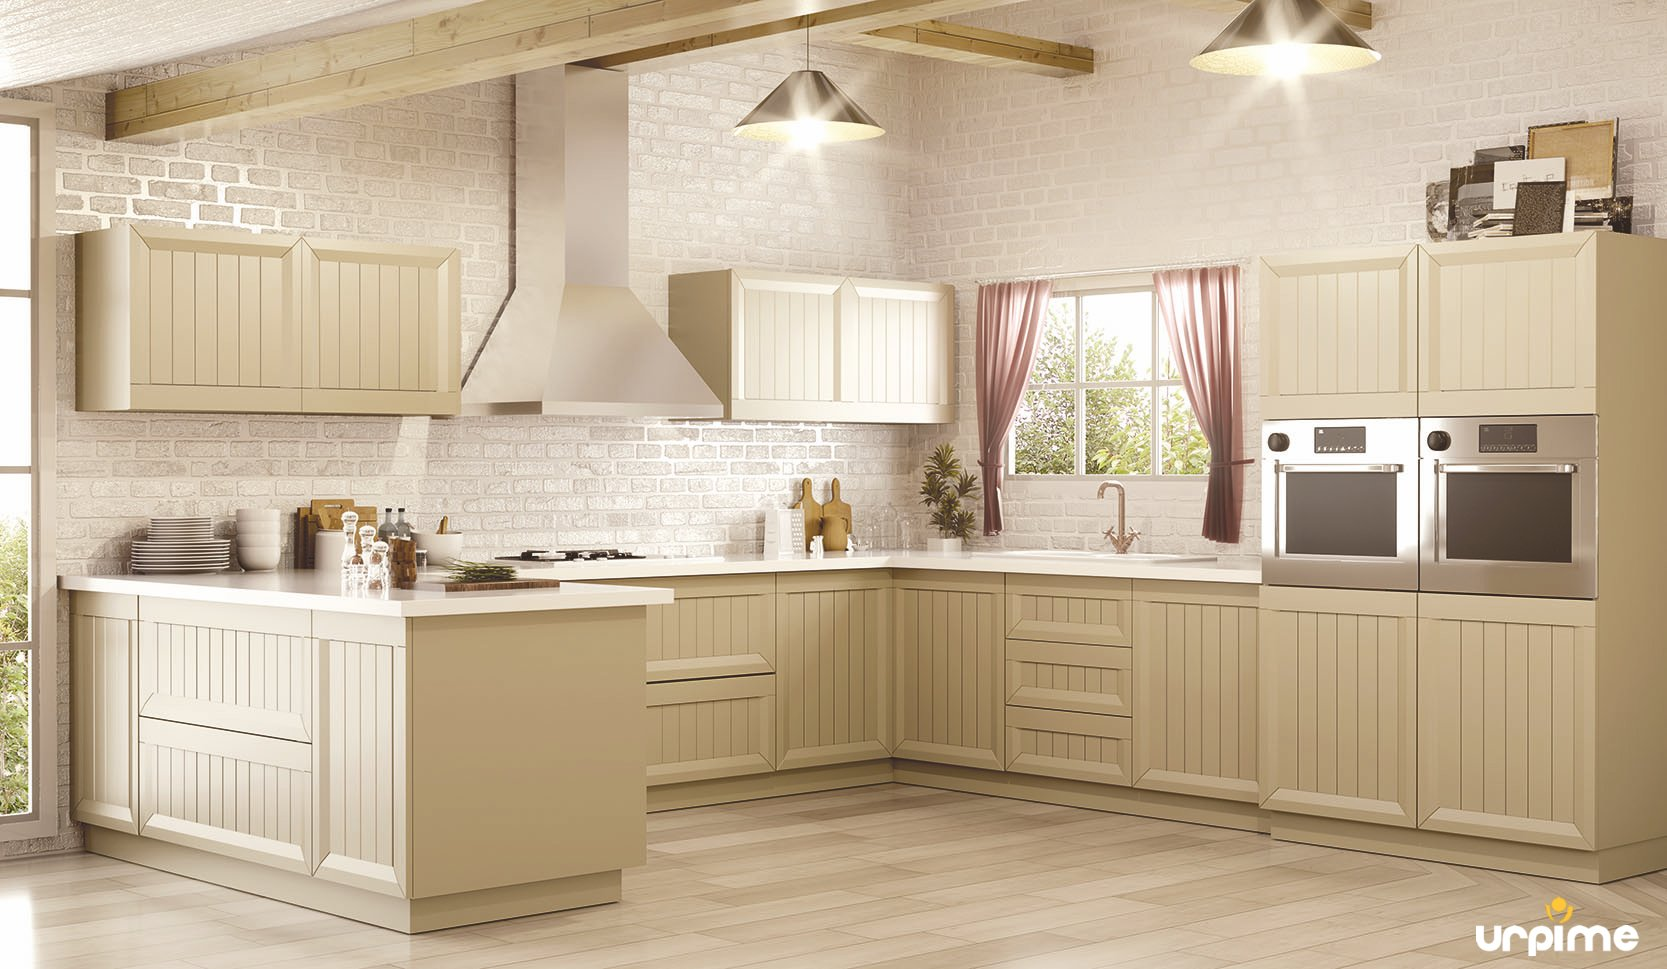 Ideas para amueblar la cocina 2 – Urpime